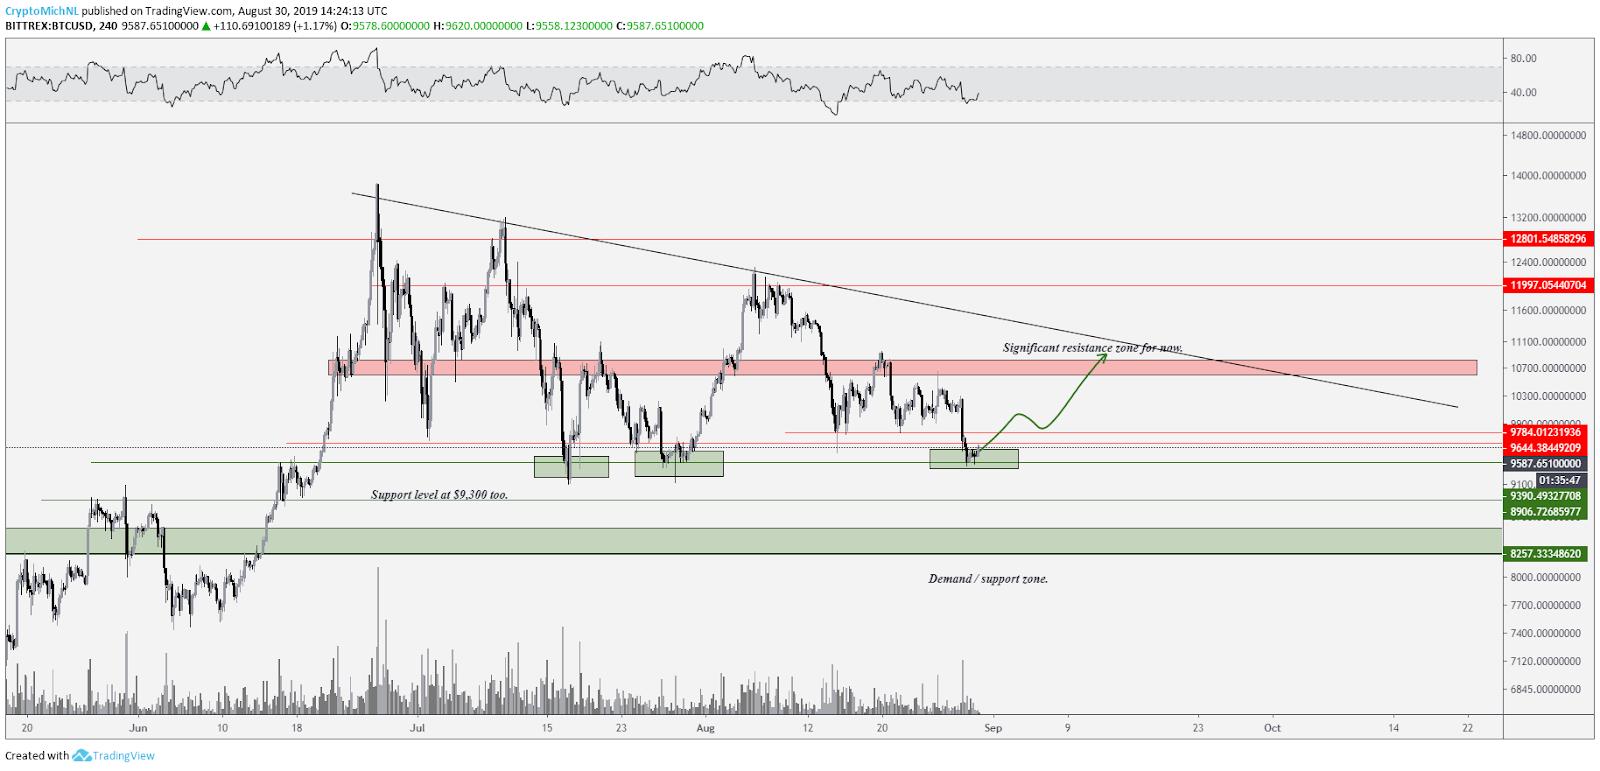 BTC/USD bullish scenario. Source: Tradingview